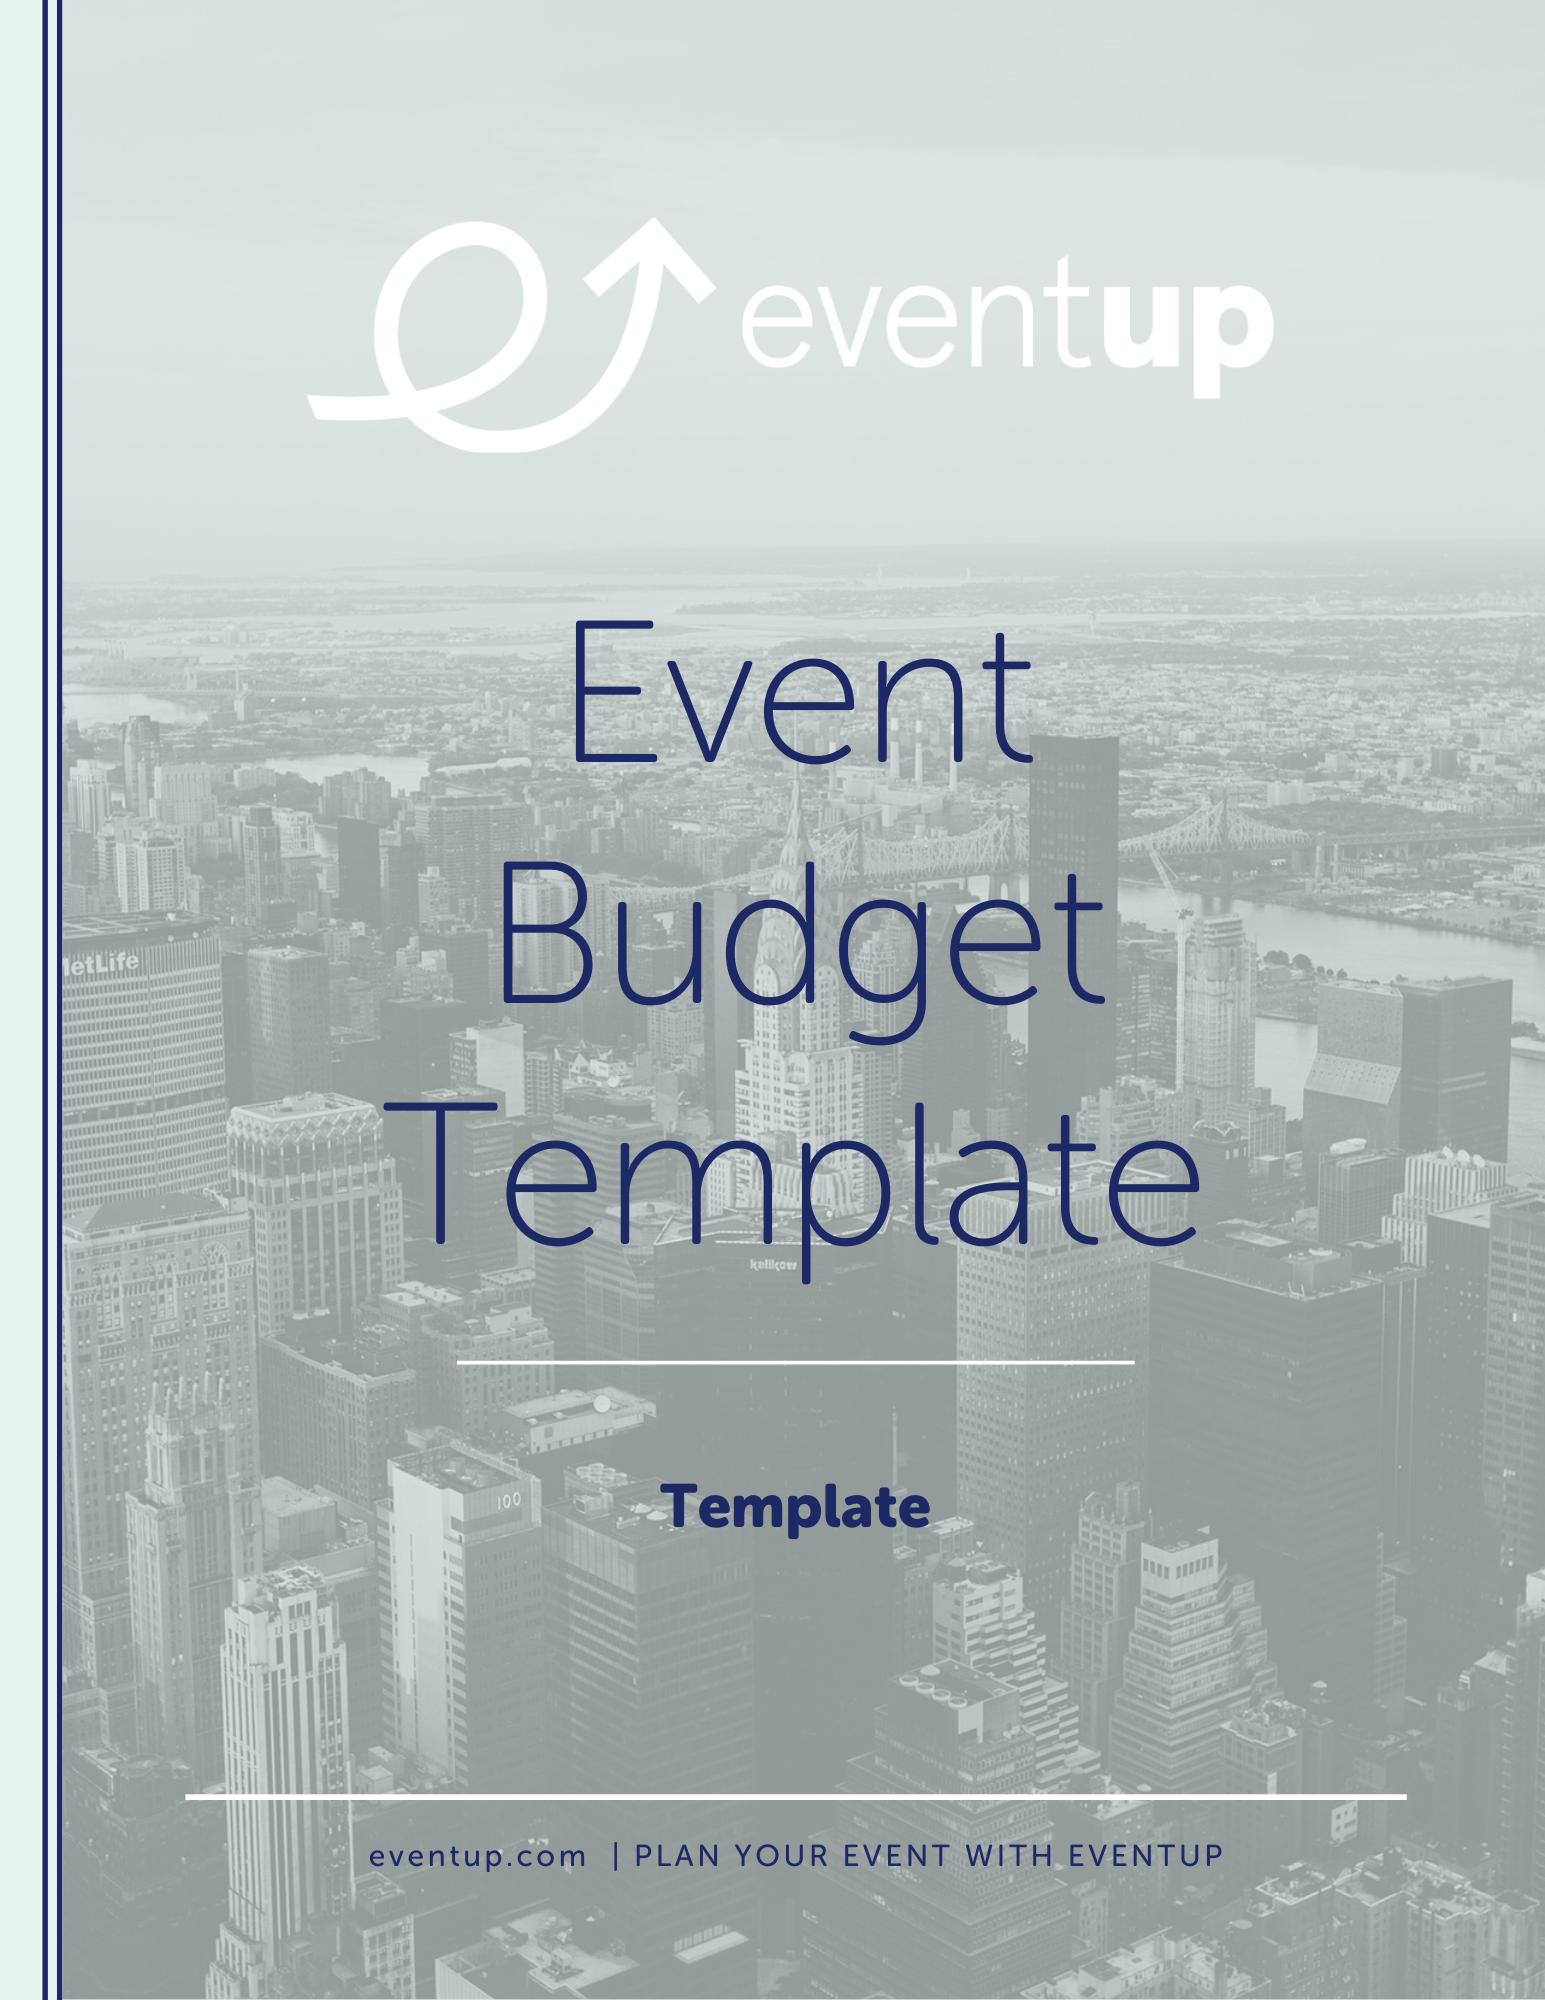 EventUp - Event Budget Template